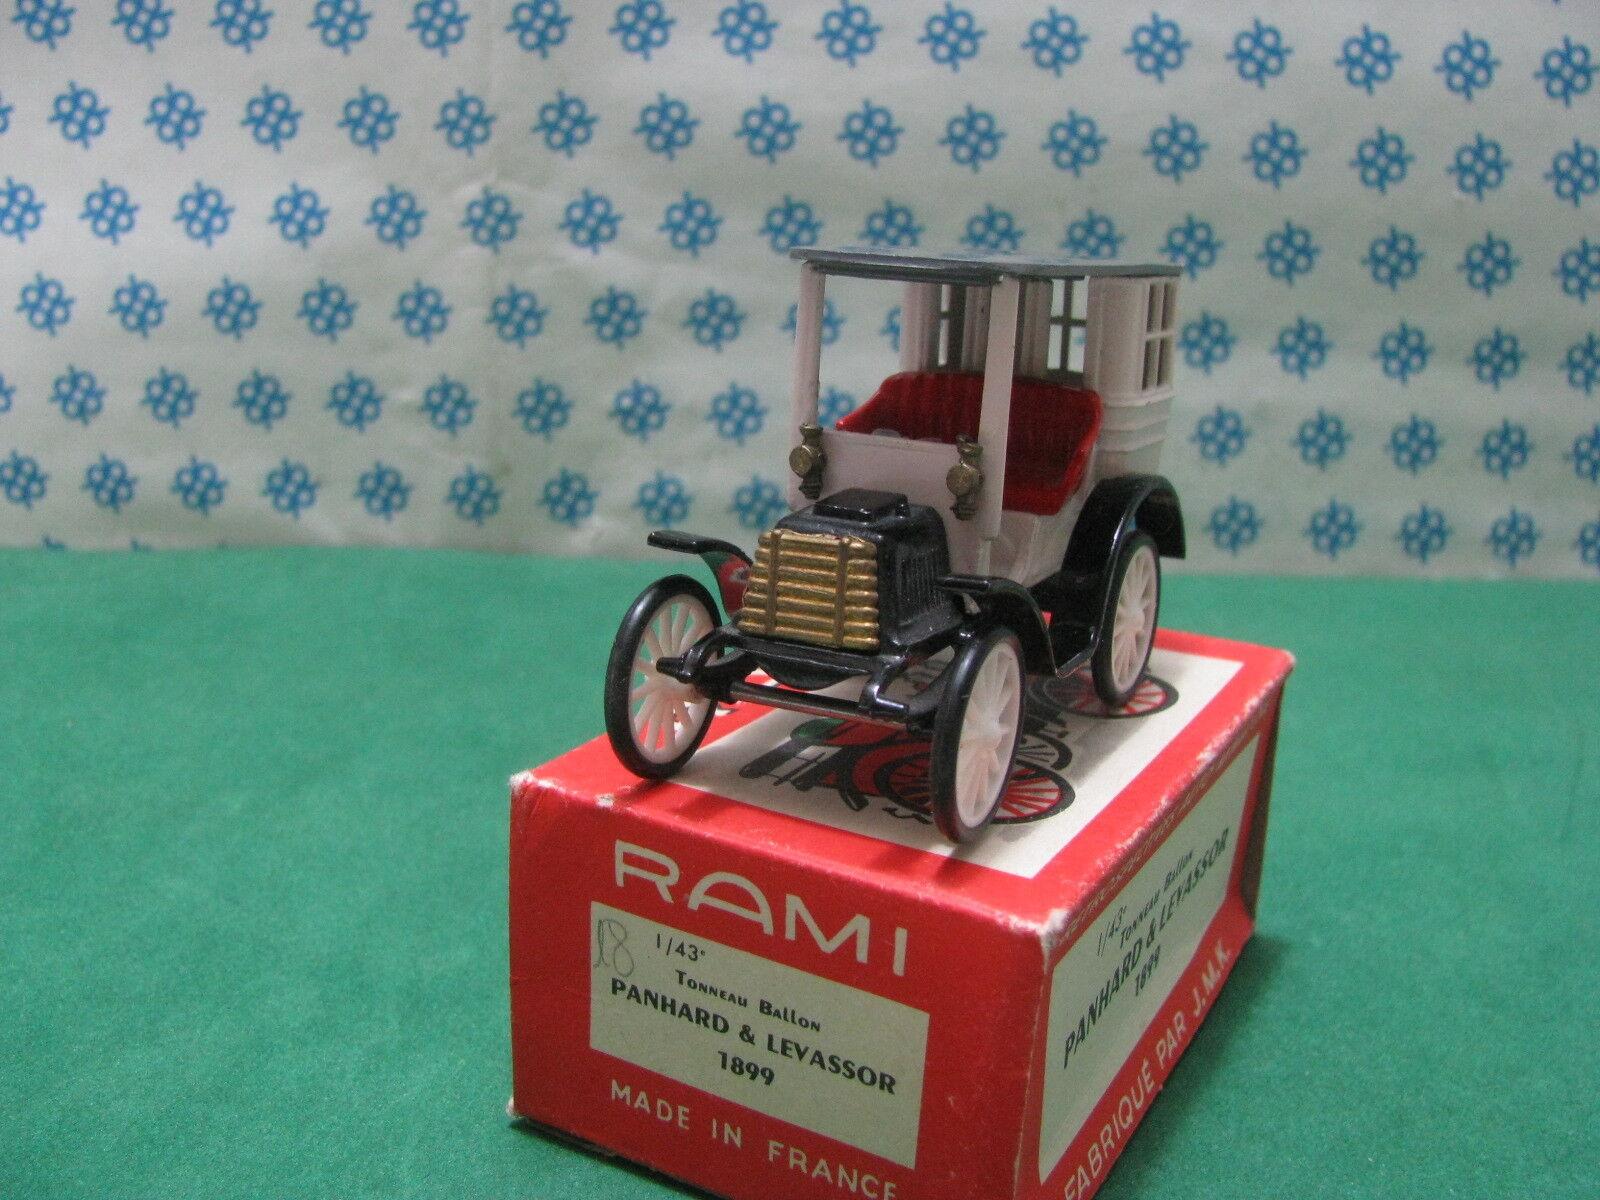 Vintage Rami N° 18 - - - Panhard & Levassor Tonneau Ballon 1899-1 43 France 6b934d